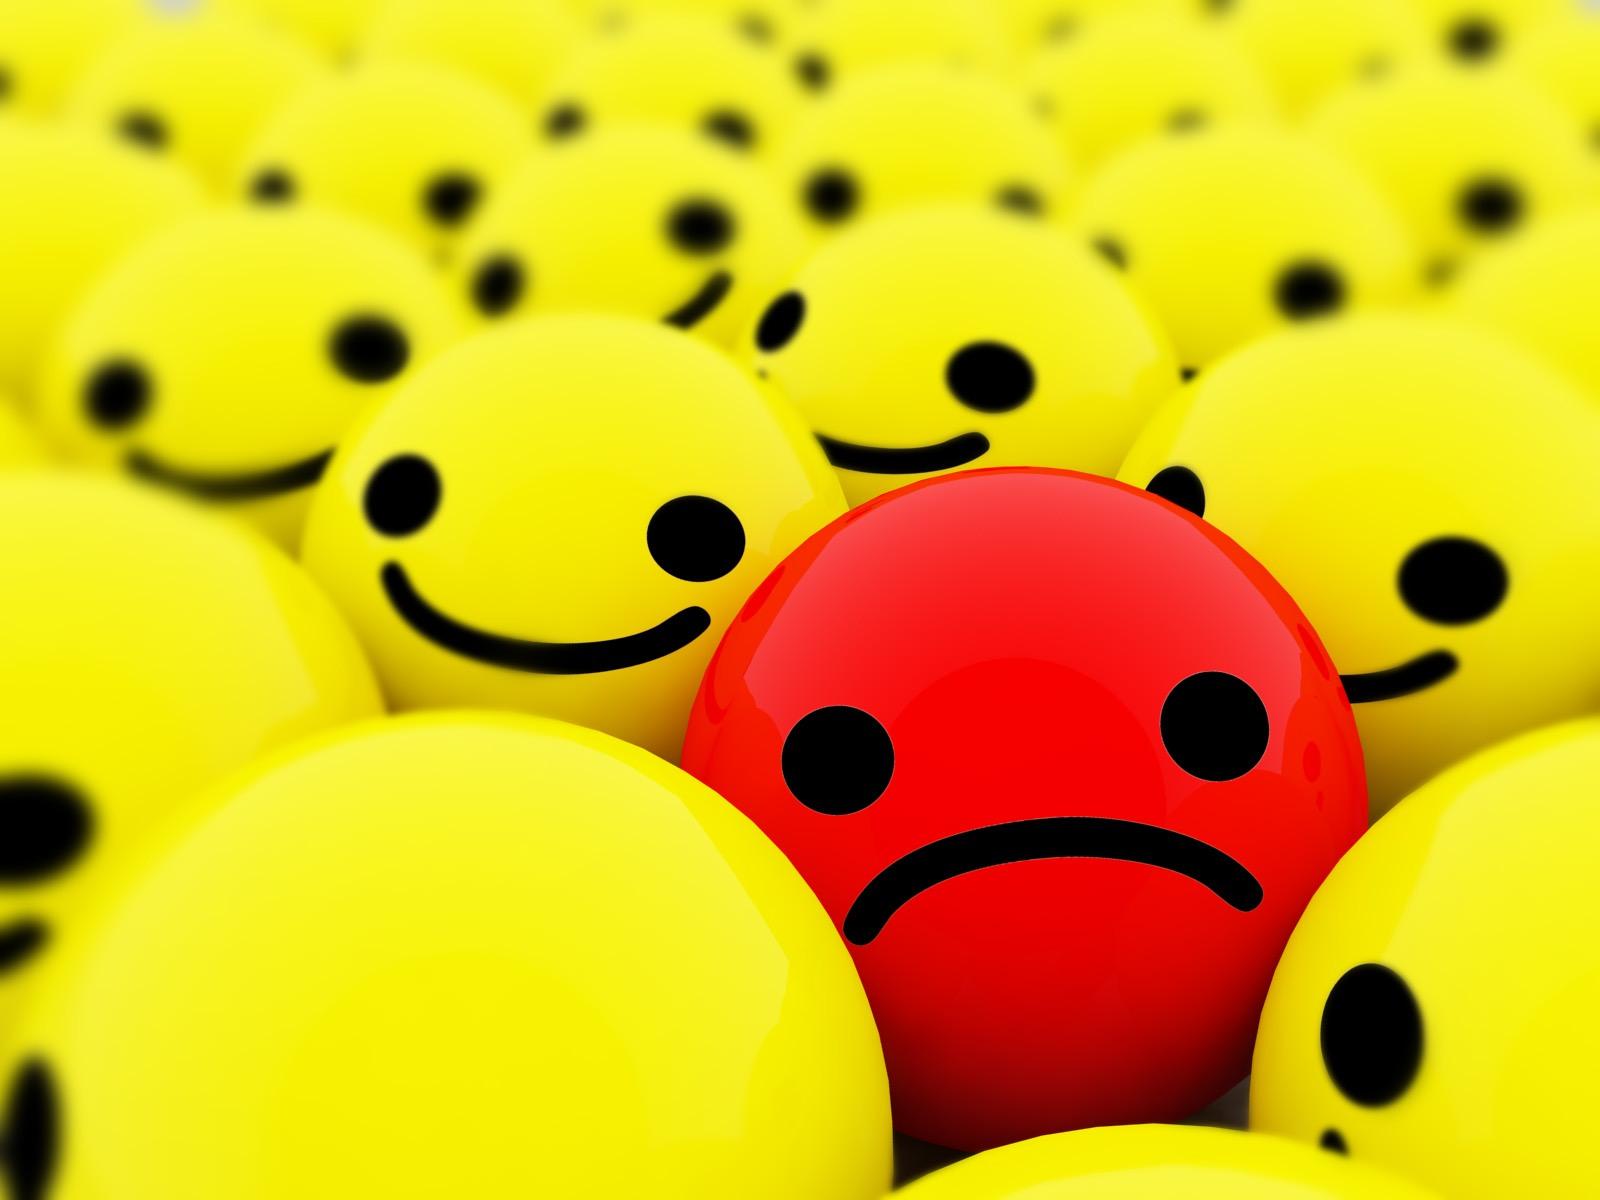 http://1.bp.blogspot.com/-8CAS-lbfxuc/UMs60bJ1LRI/AAAAAAAACJ8/jUE6hGEdkB8/s1600/emoticons-sad.jpg